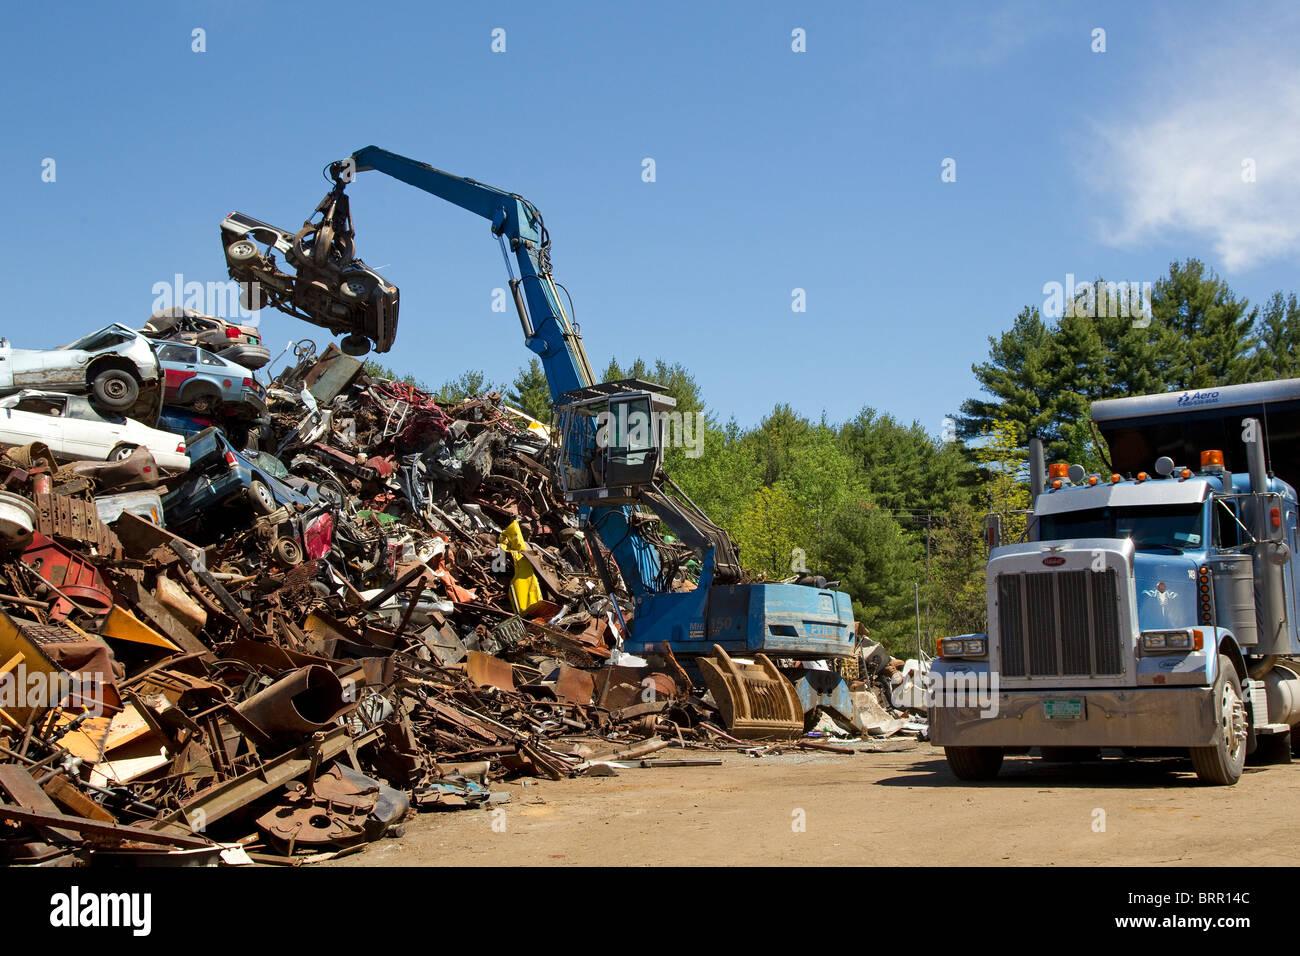 Crane loading semi truck with crushed cars, scrap metal automobiles ...